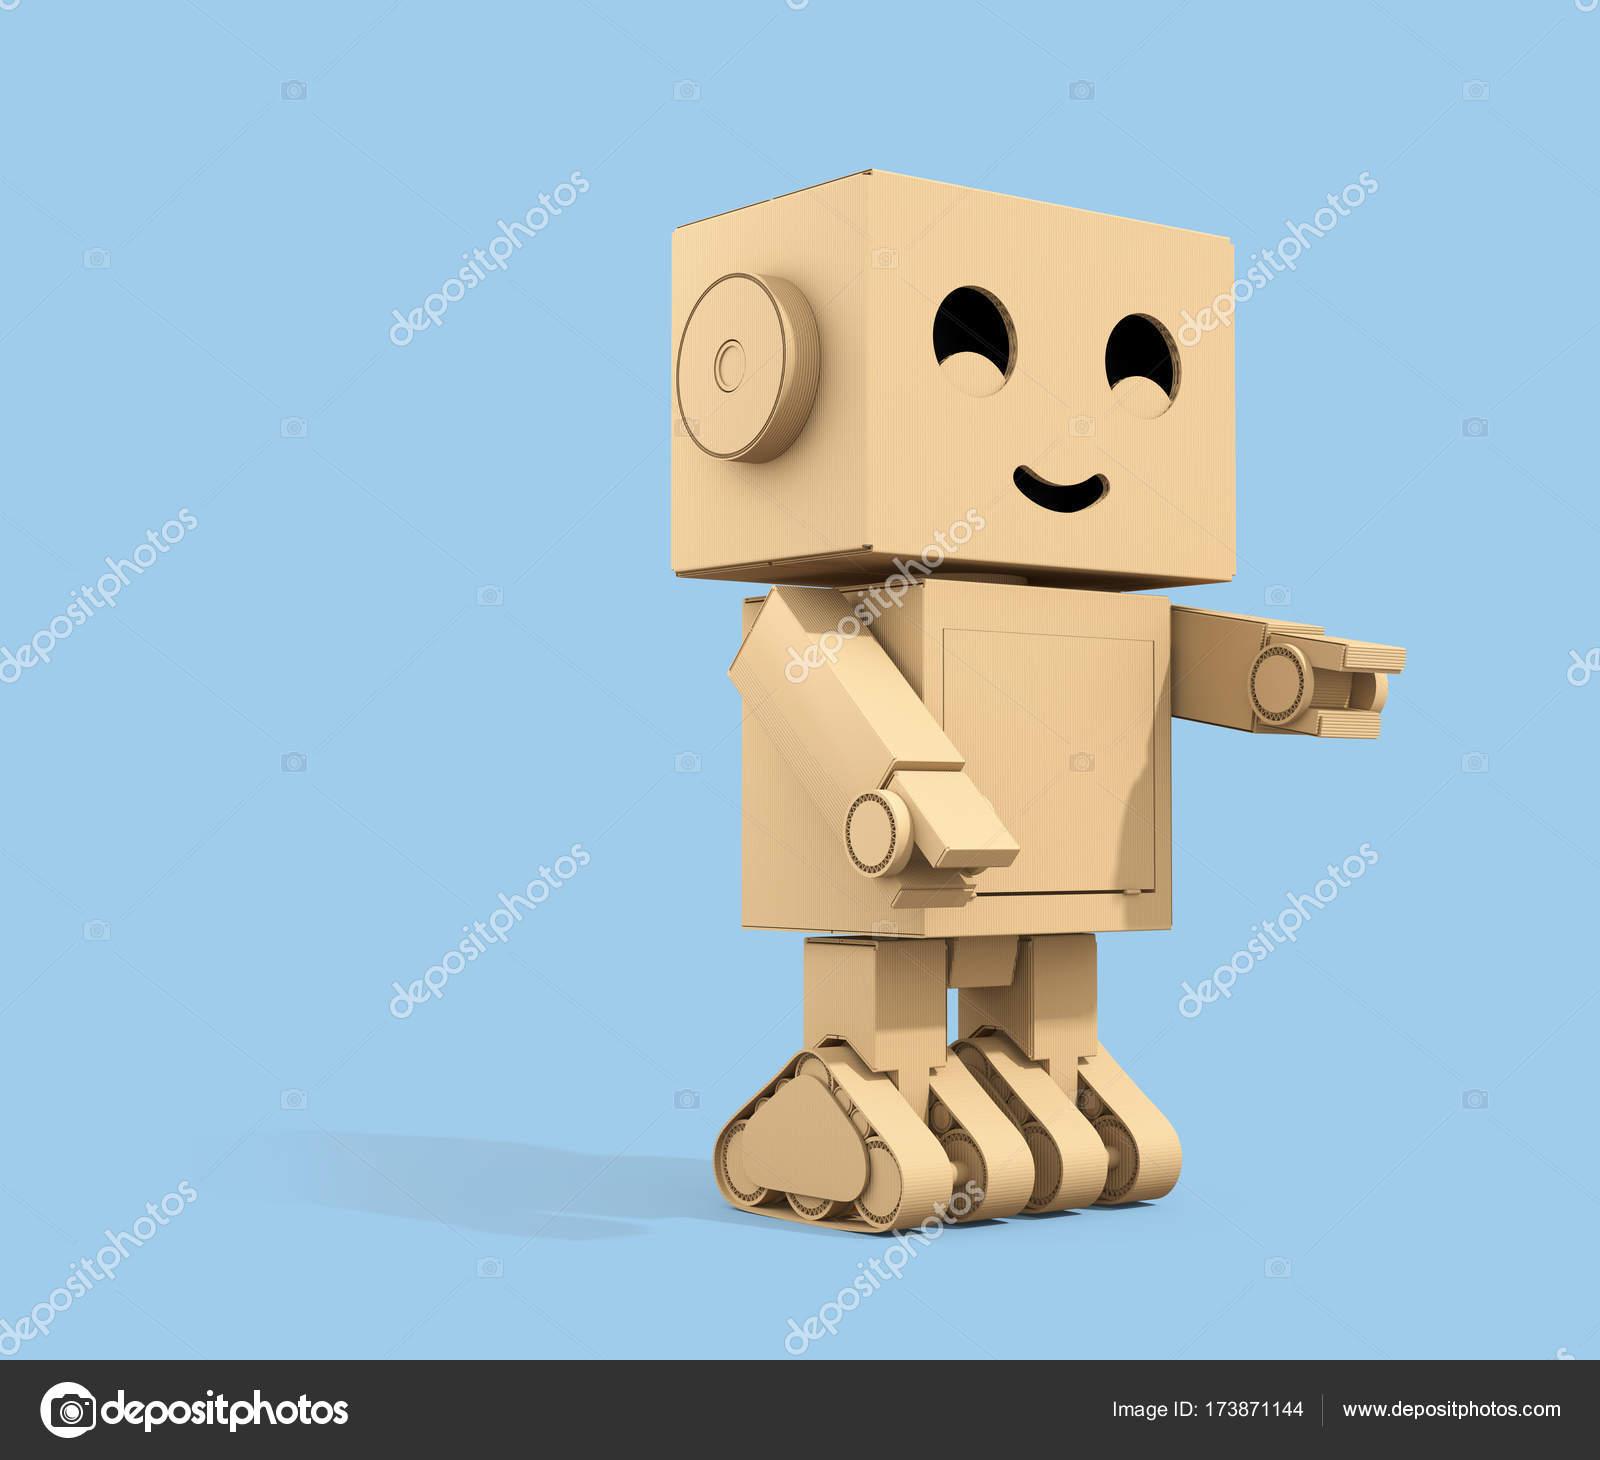 Imagenes De Robot De Carton Dibujos Animados Lindo Personaje De Robot Cart 243 N Aislado